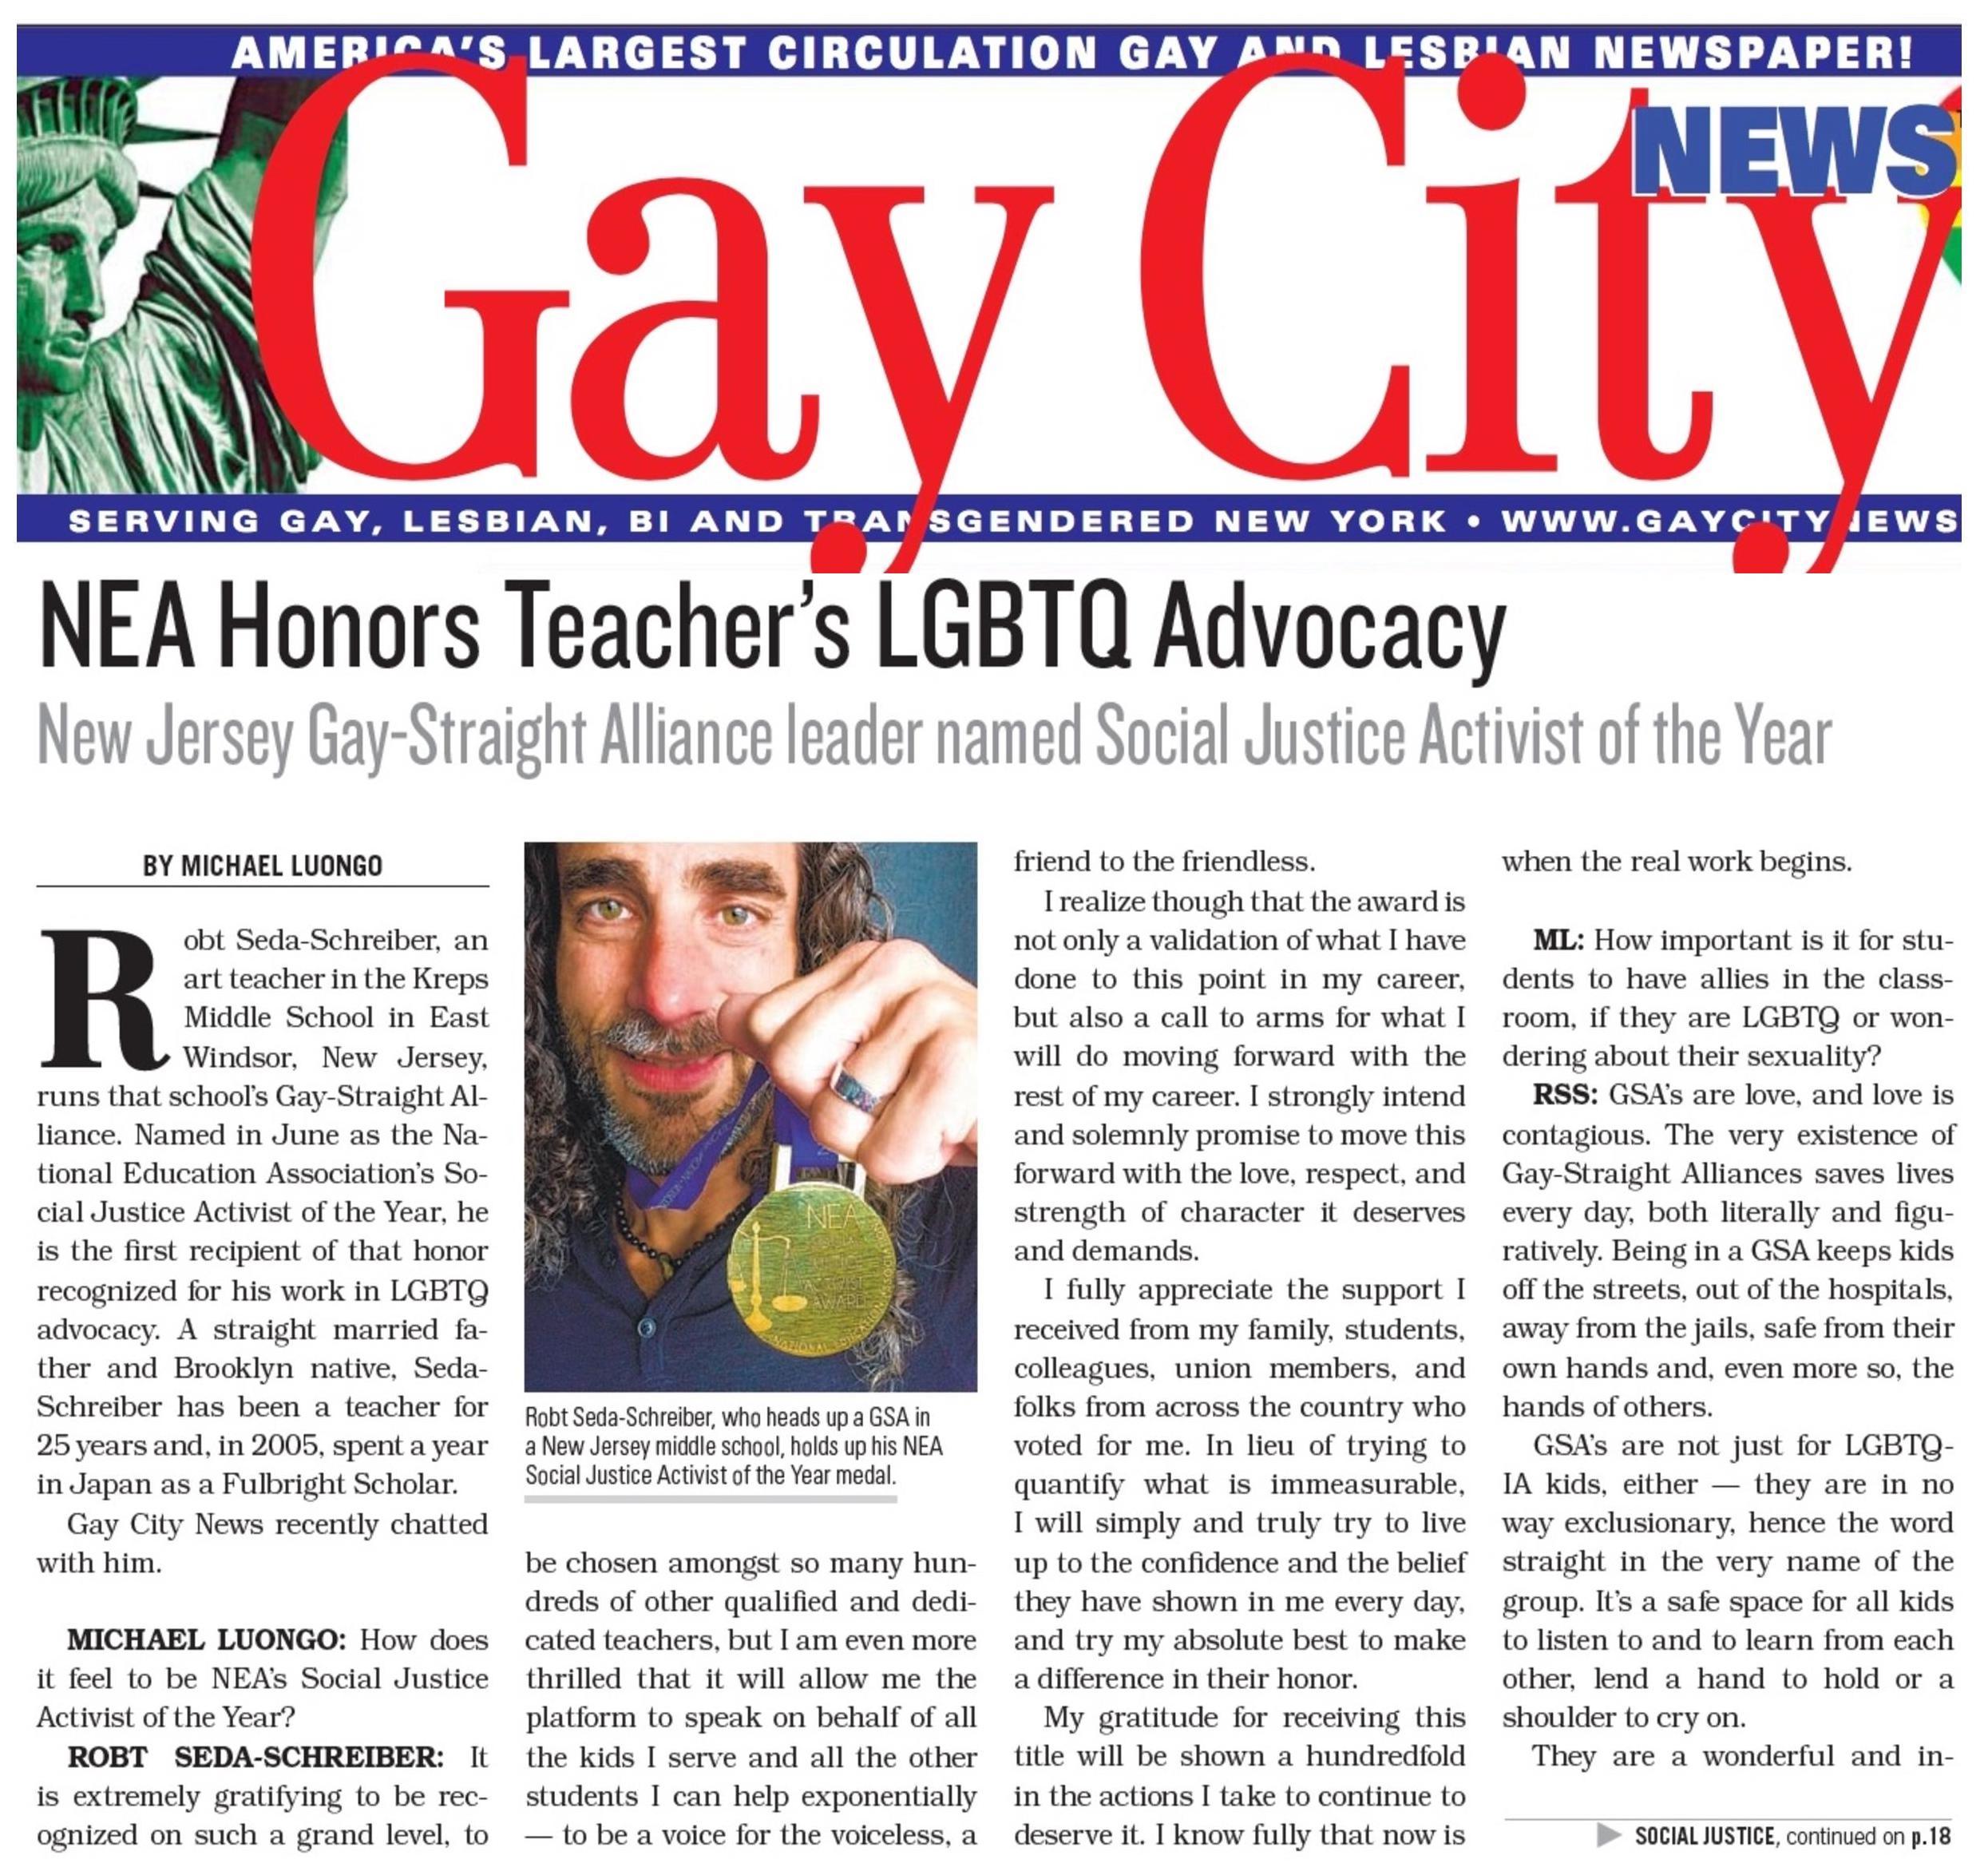 Robt Seda-Schreiber visits Gay City!.jpg